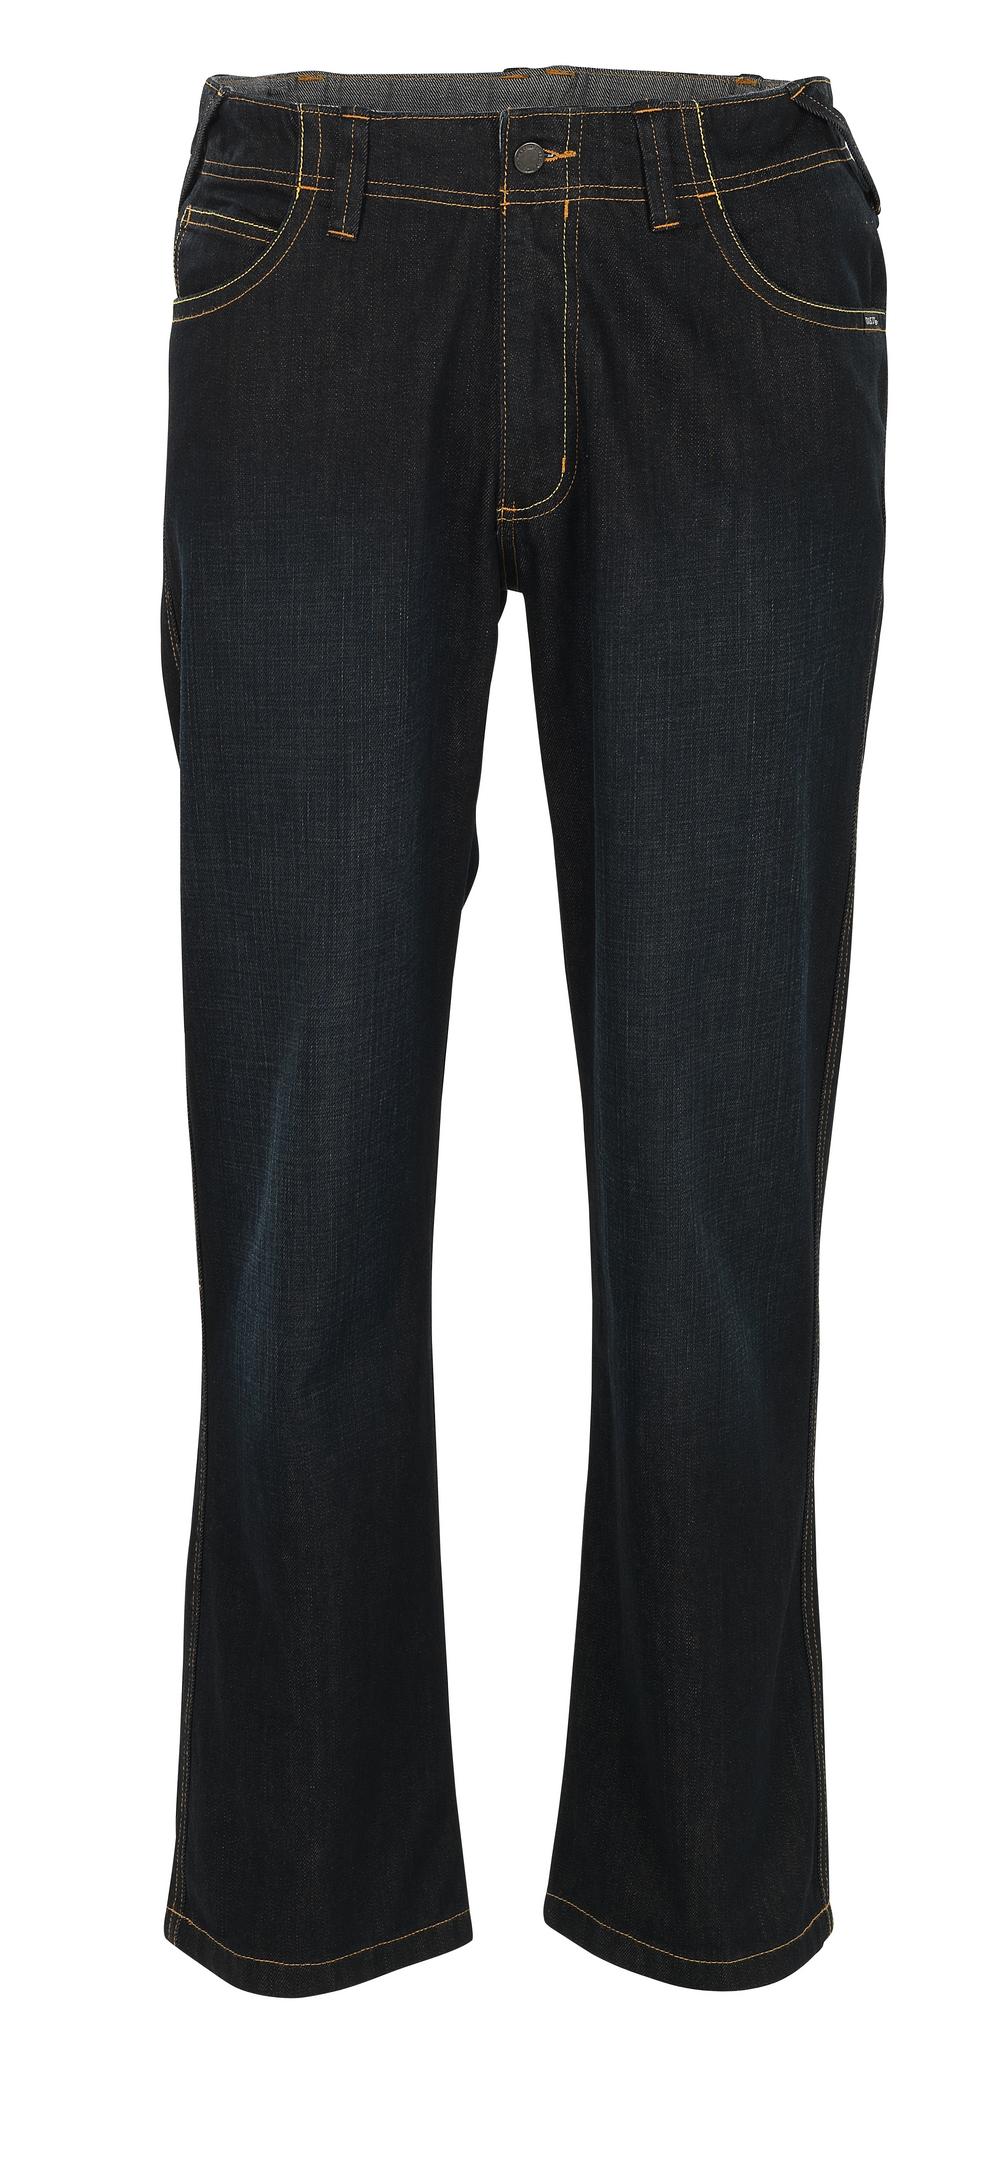 50403-869-A32 Jeans - dark denim blue